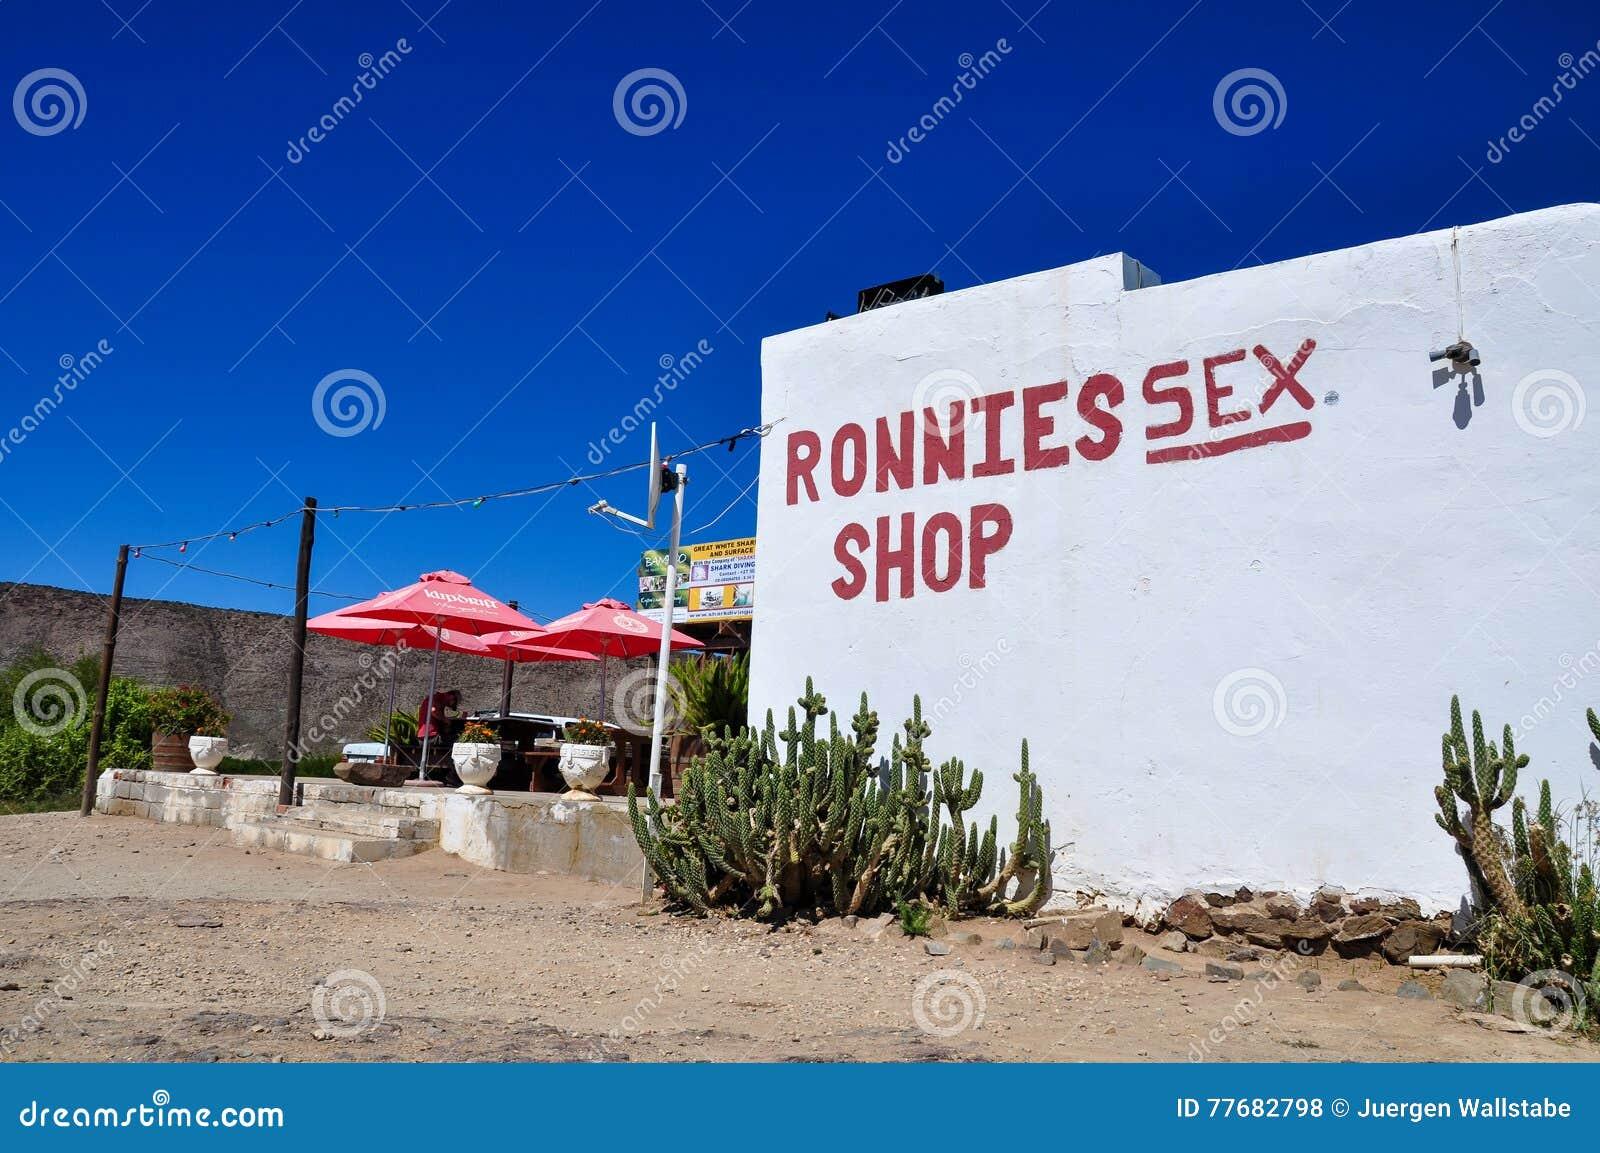 Matildascoza SAs Online Adult Sex Toy & Lingerie Shop